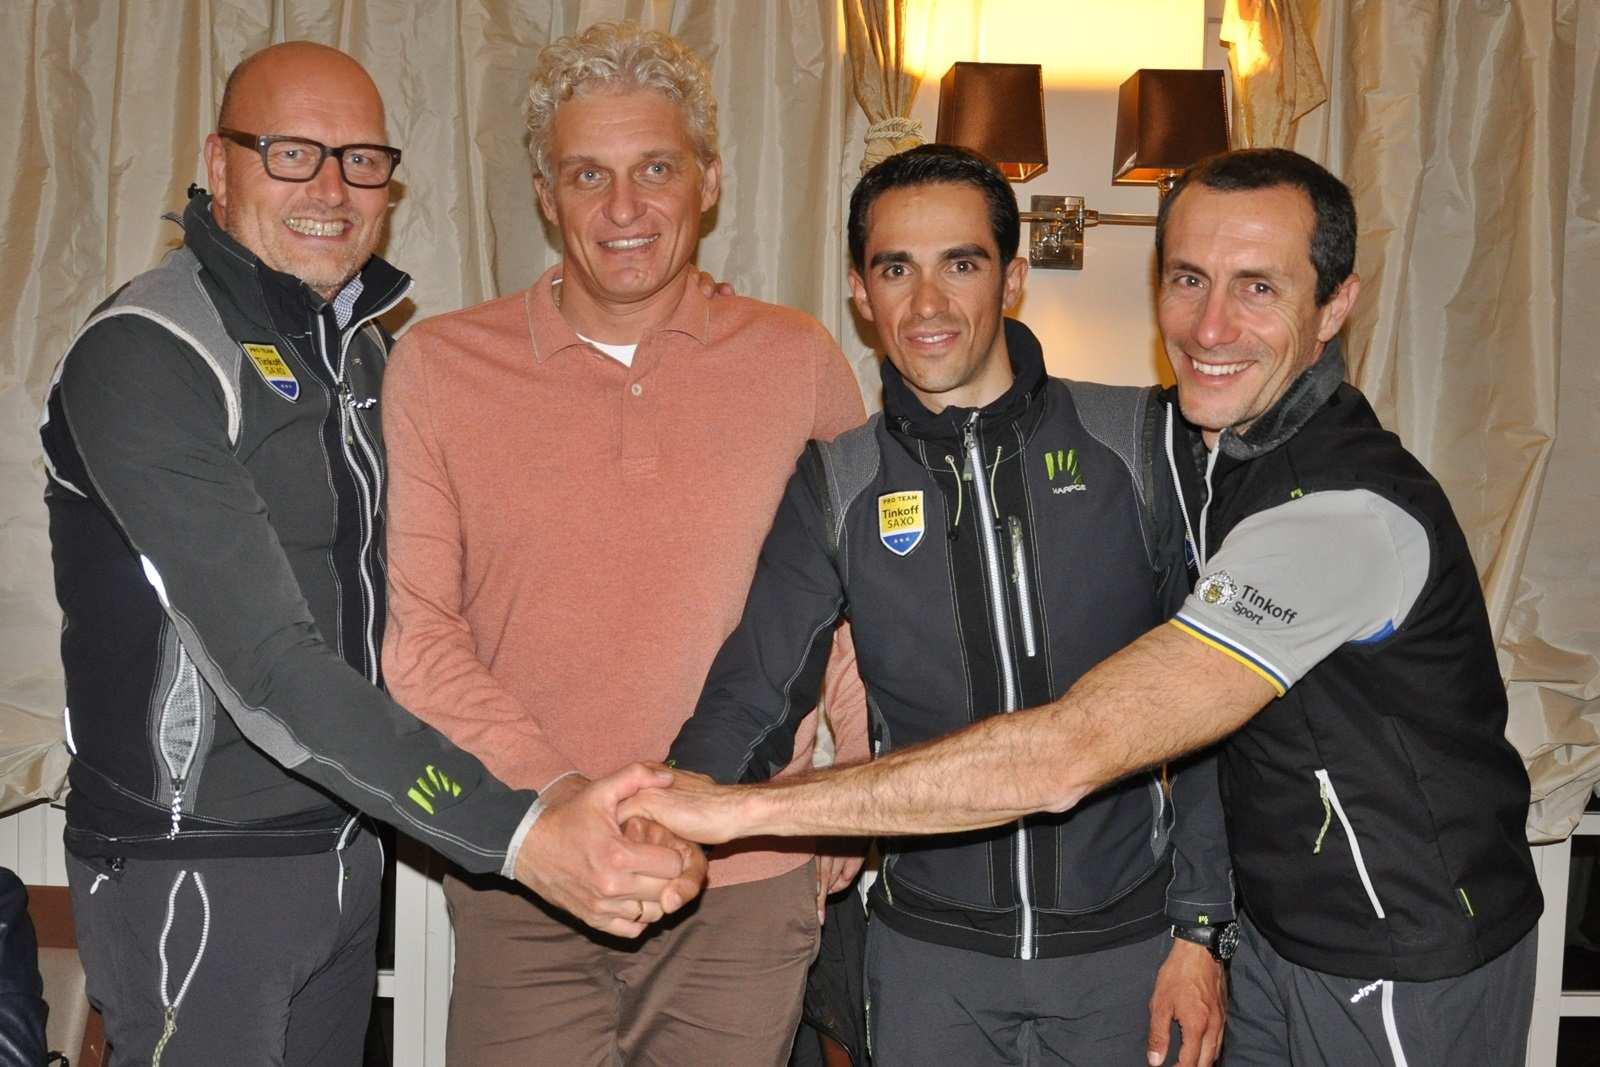 Bjarne Riis, Manager de Tinkoff-Saxo Manager, Oleg Tinkov, capo y dueño de Tinkoff-Saxo, Alberto Contador y Stefano Feltrin, CEO de Tinkoff-Saxo